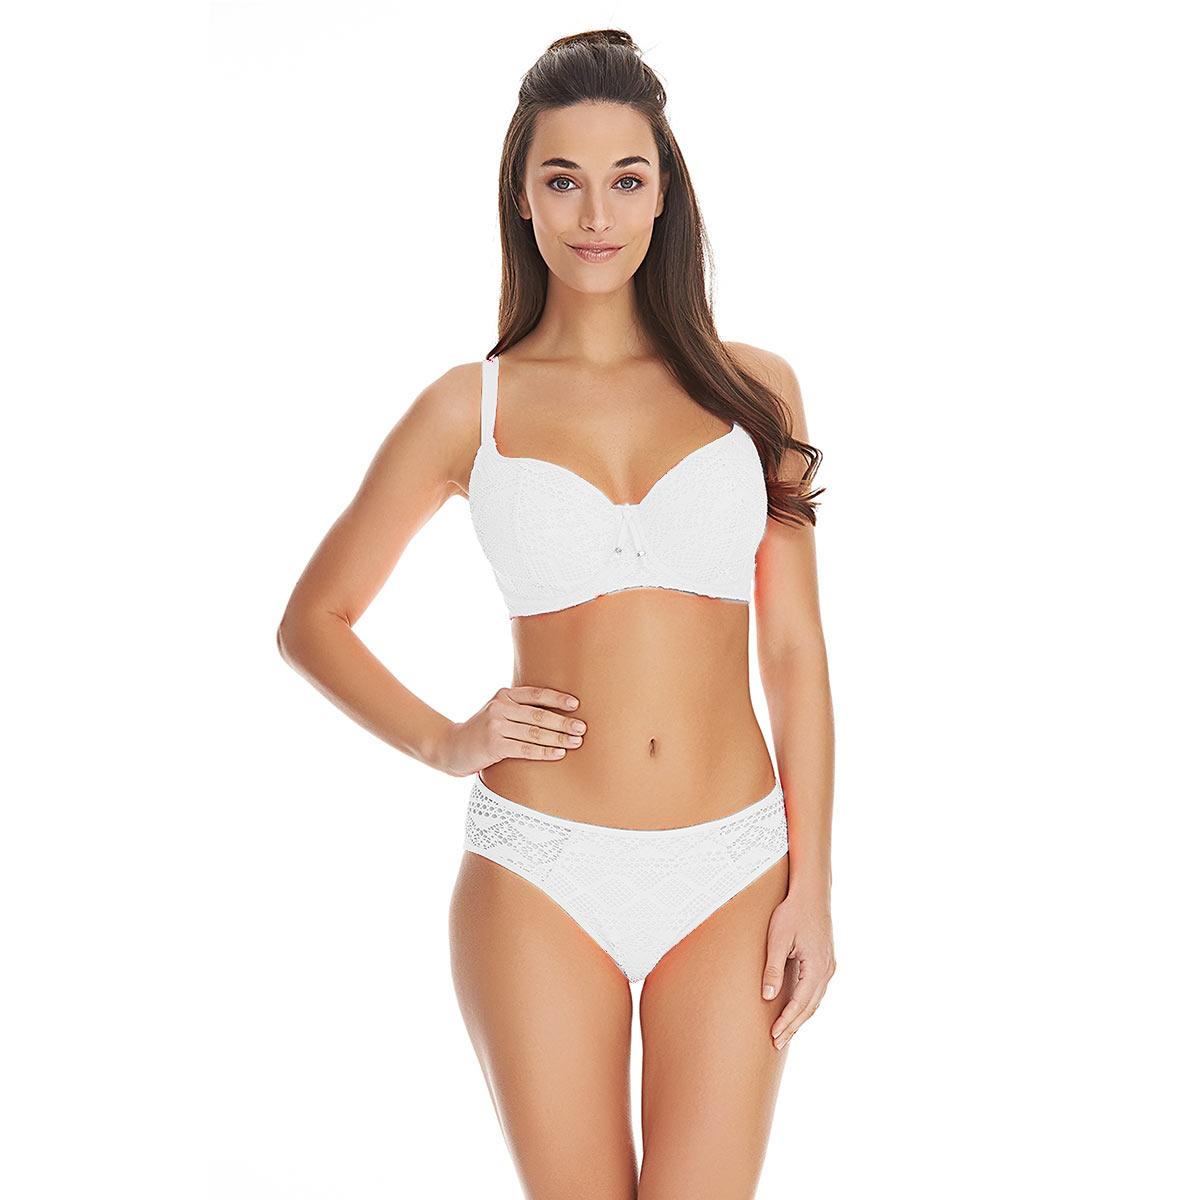 Bikini Cup D - Bikinis Große Cups   Monpetitbikini.de 38c0868407